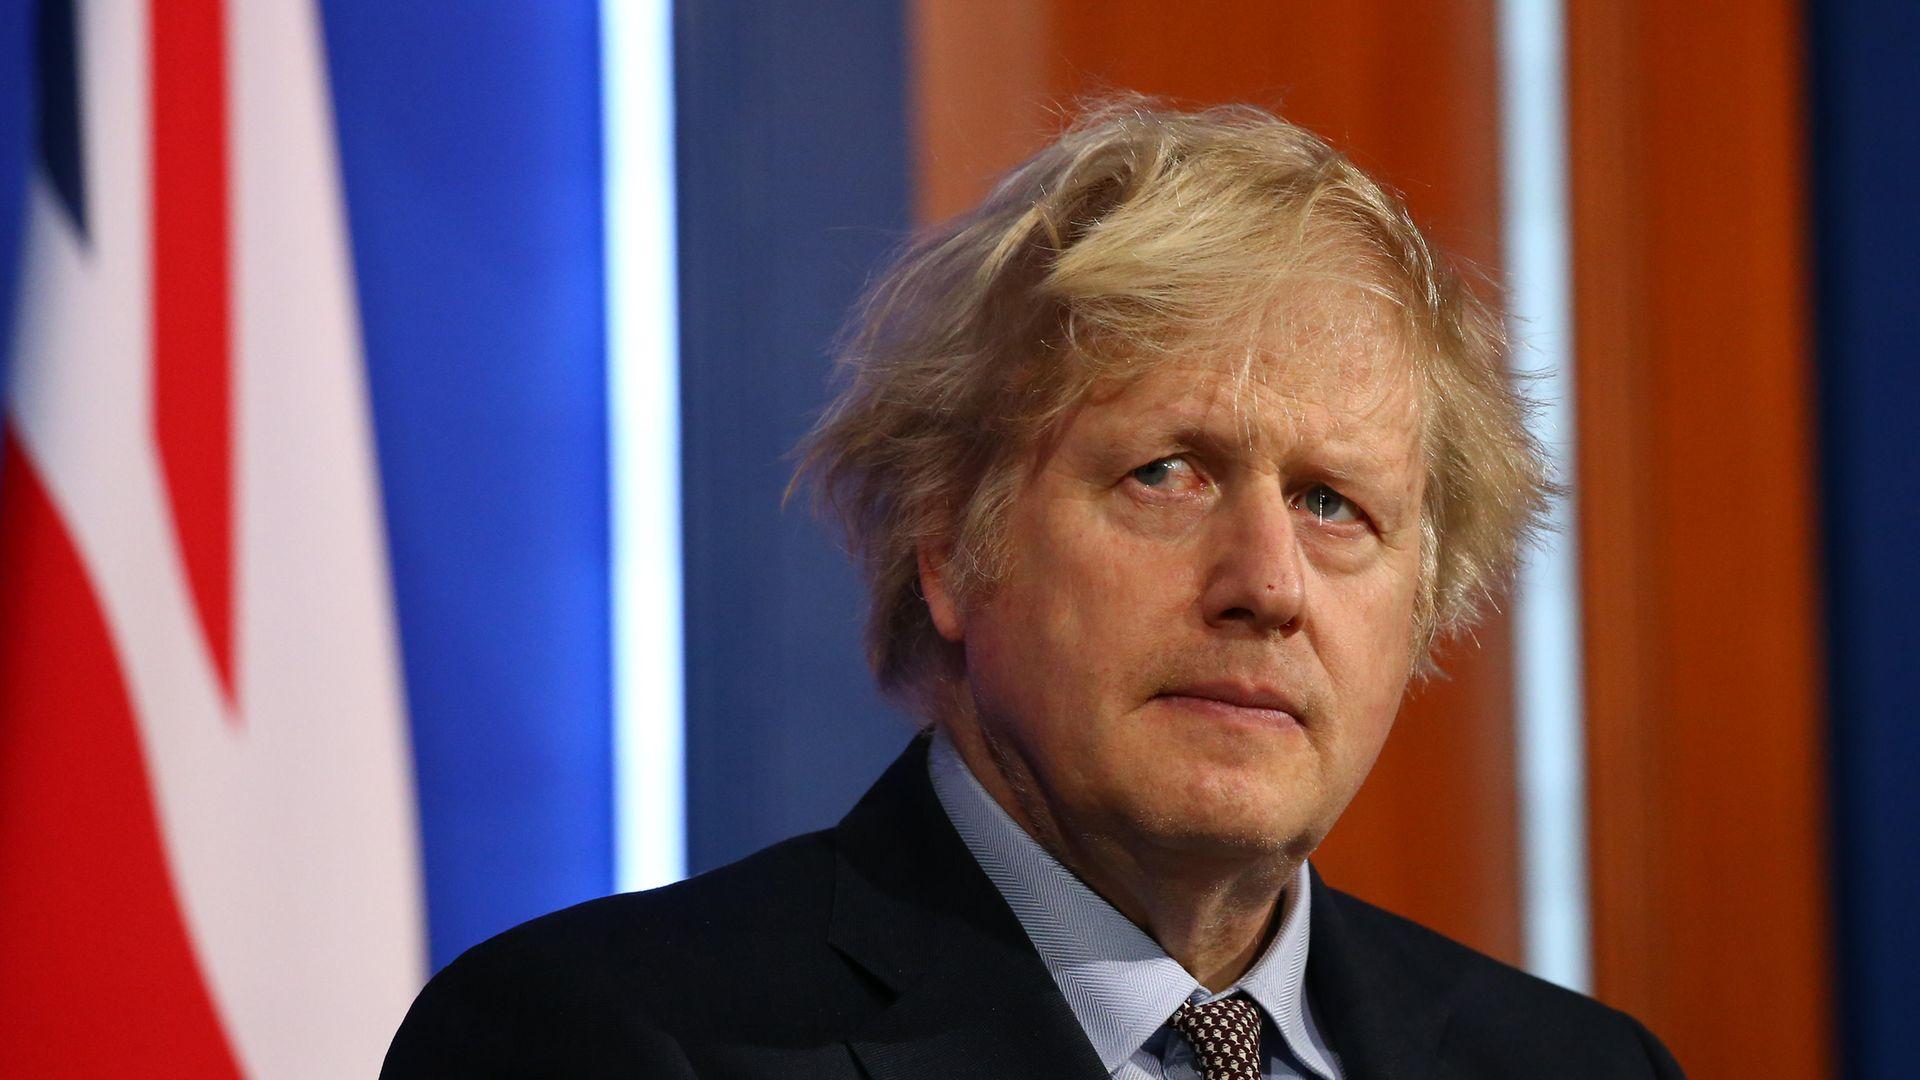 Prime minister Boris Johnson at a media briefing - Credit: PA